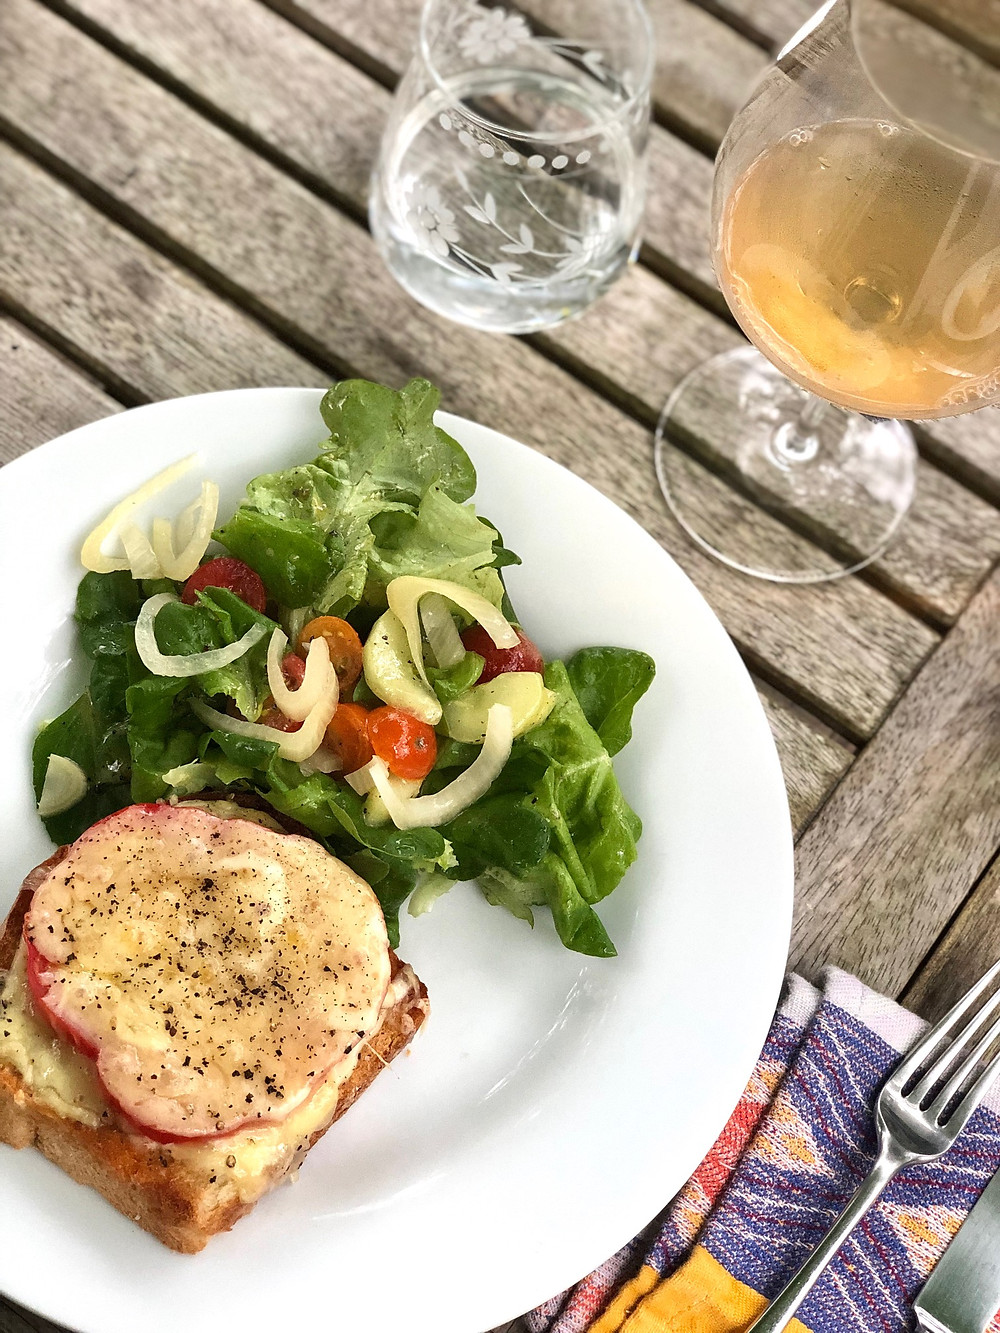 tomato toast, tomato sandwich, duke's mayonnaise, heirloom tomatoes, eat local, local recipe